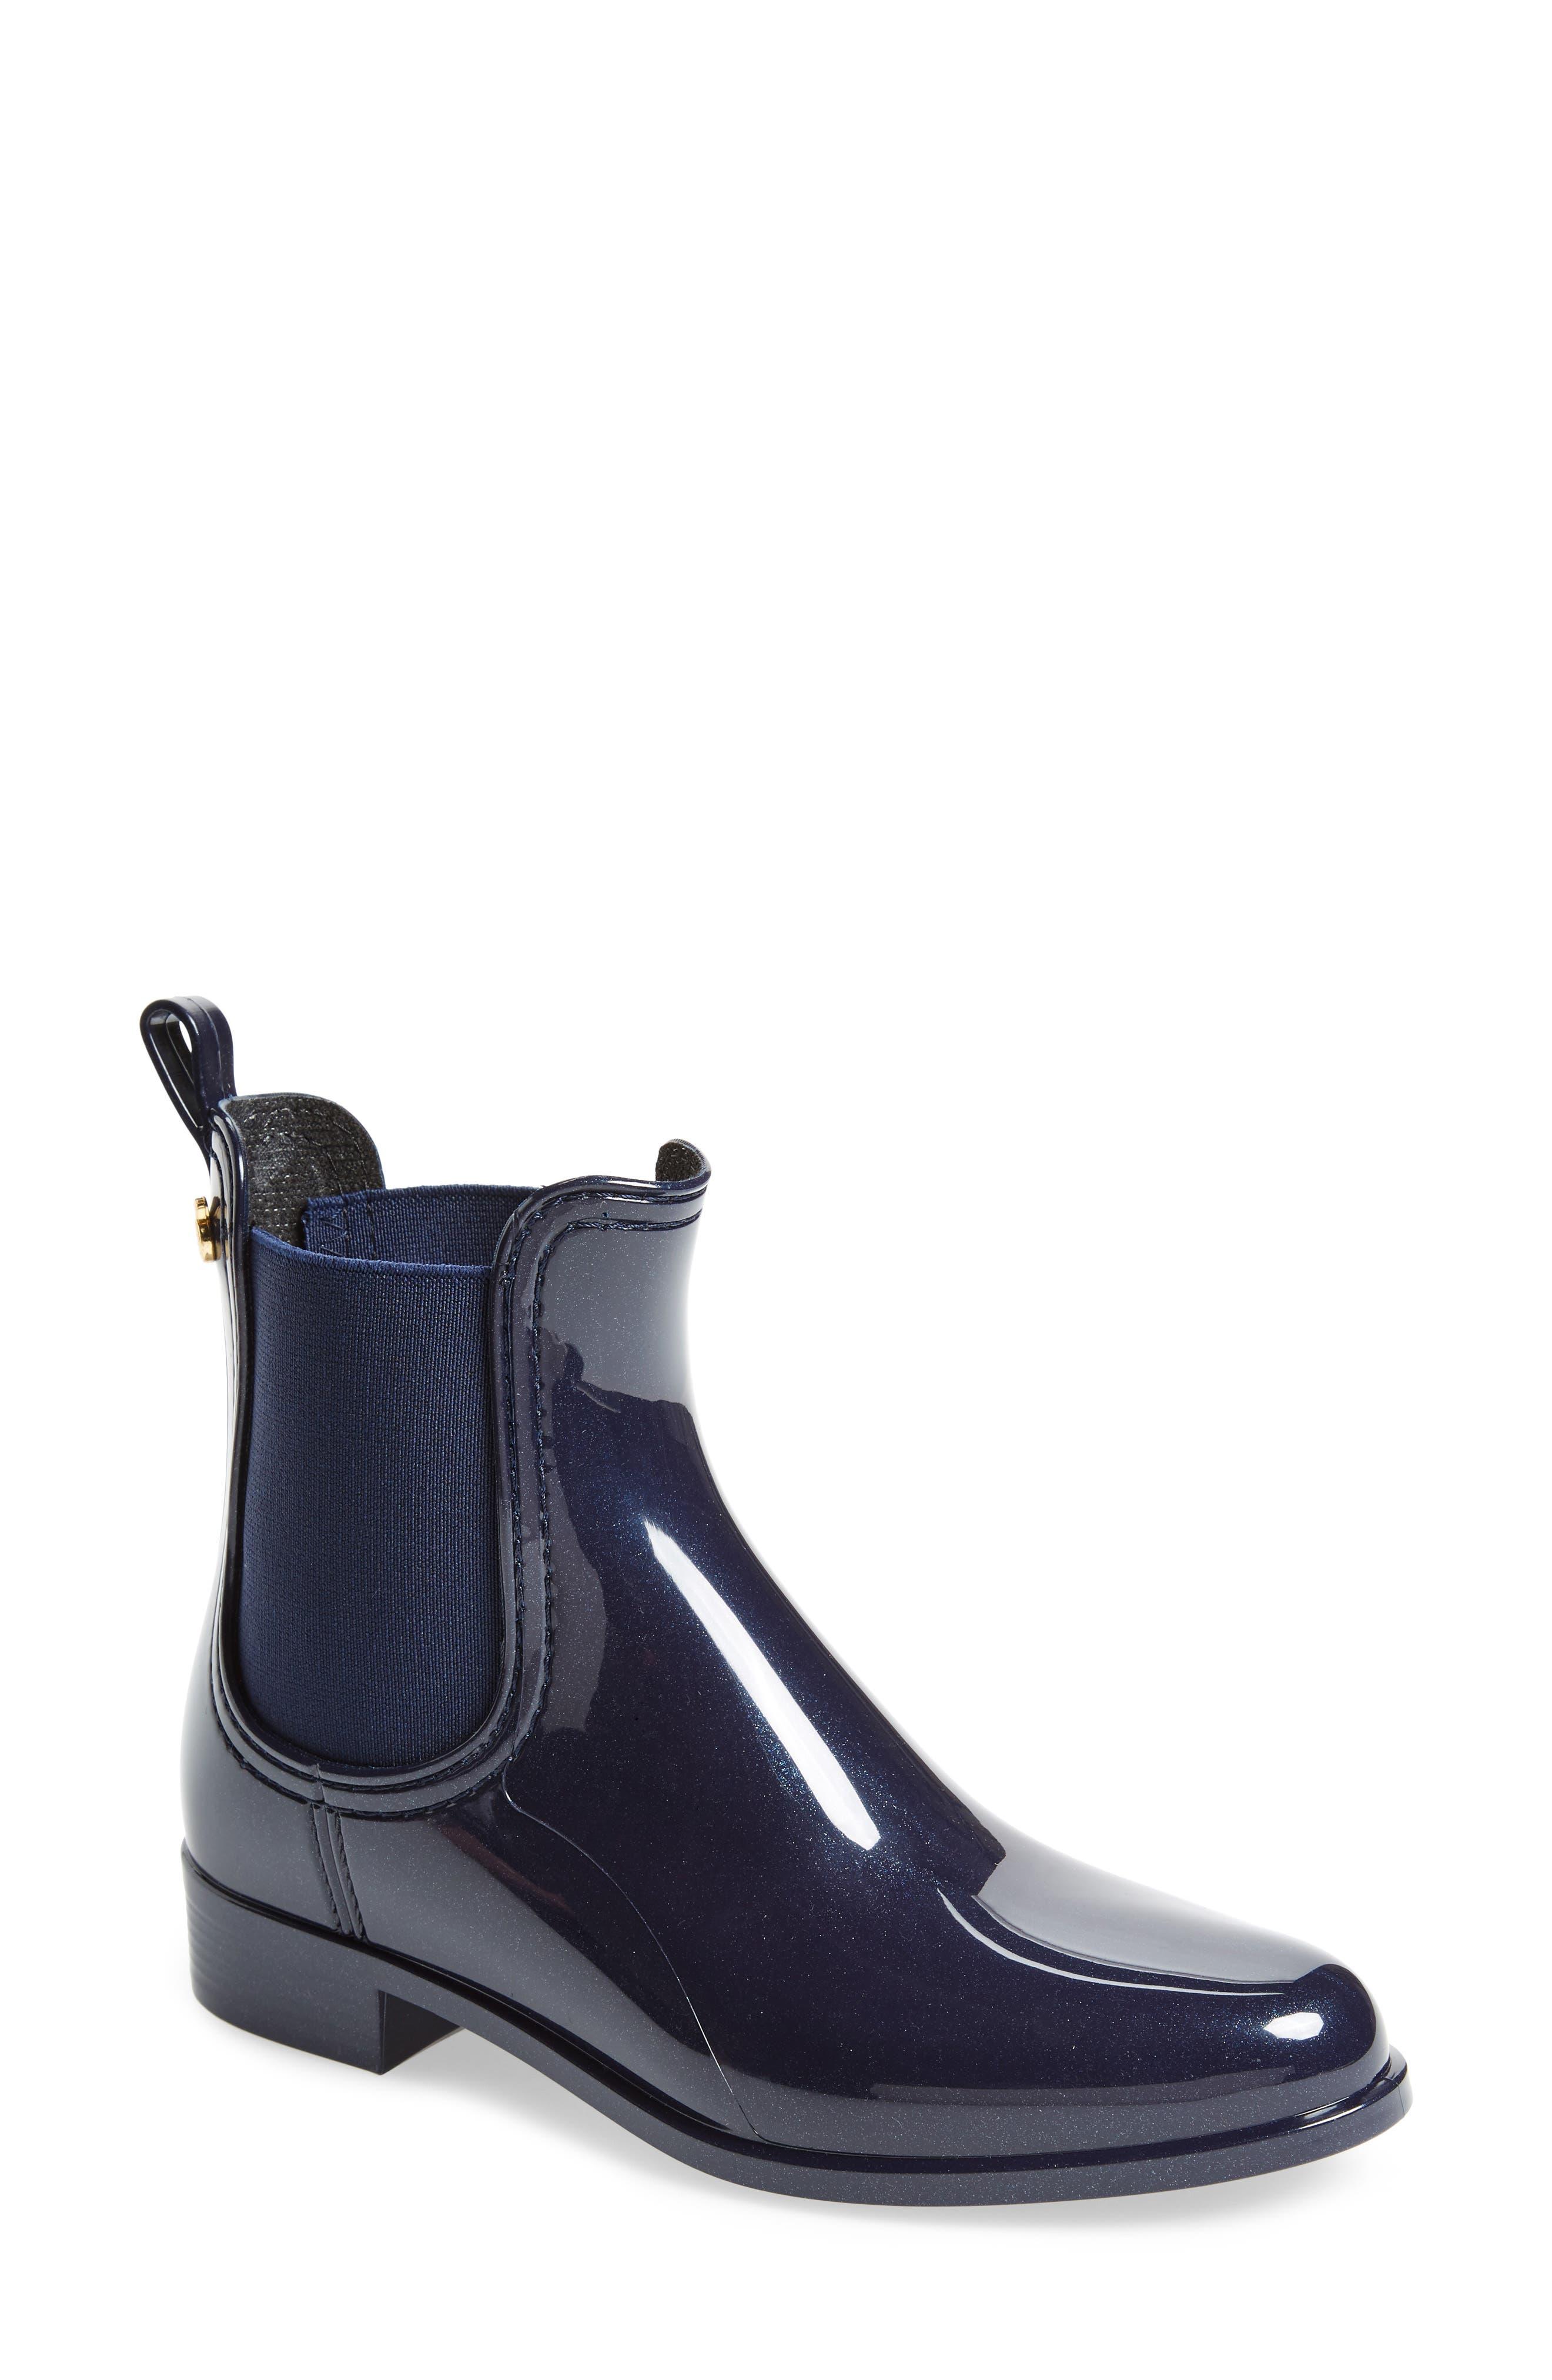 Main Image - Lemon Jelly Comfy Waterproof Chelsea Boot (Women)